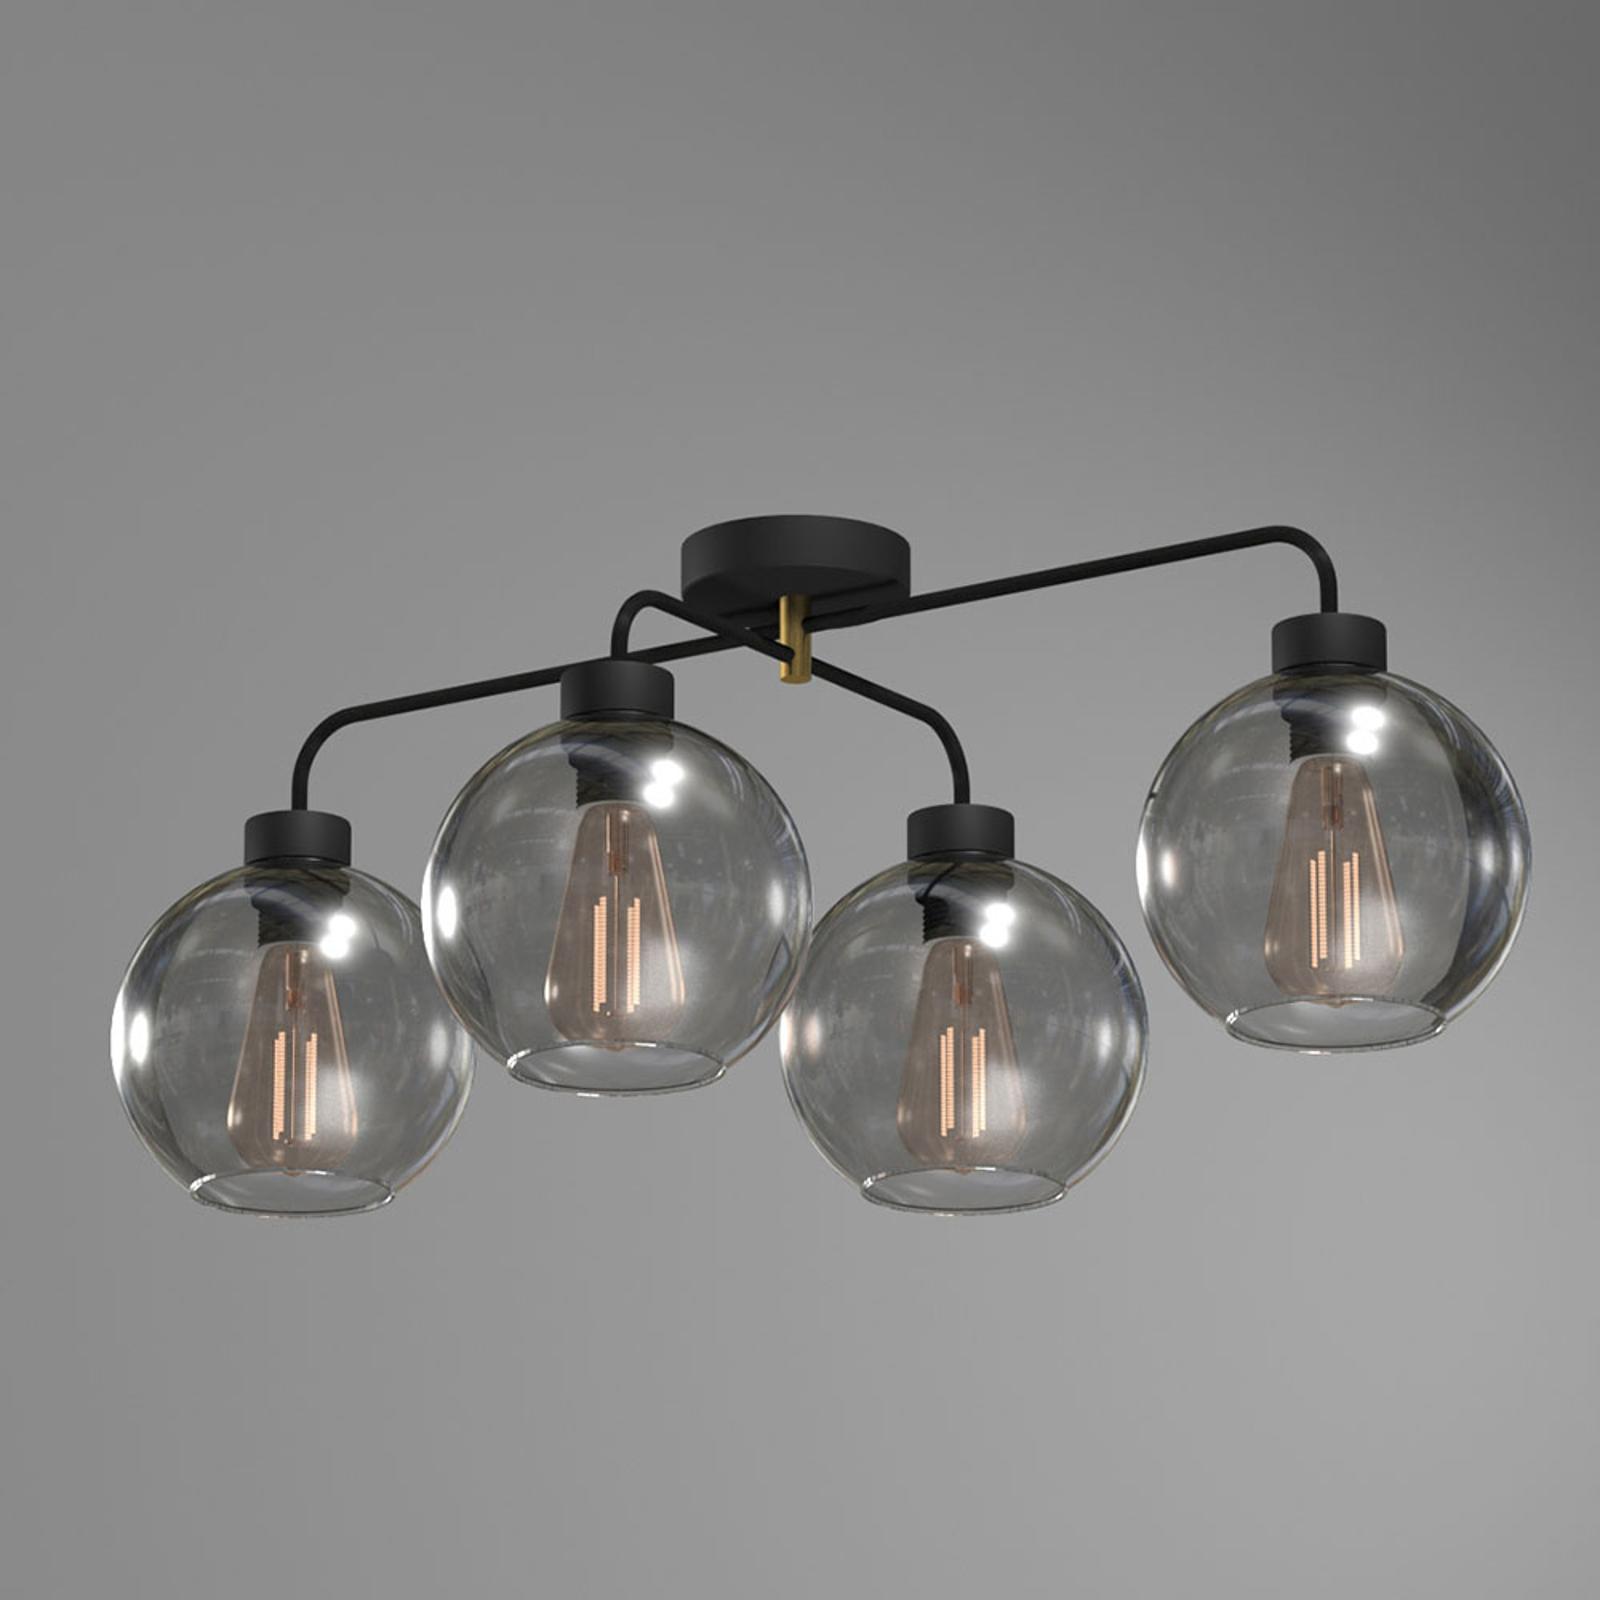 Lampa sufitowa Bari ze szkła, 4-punktowa